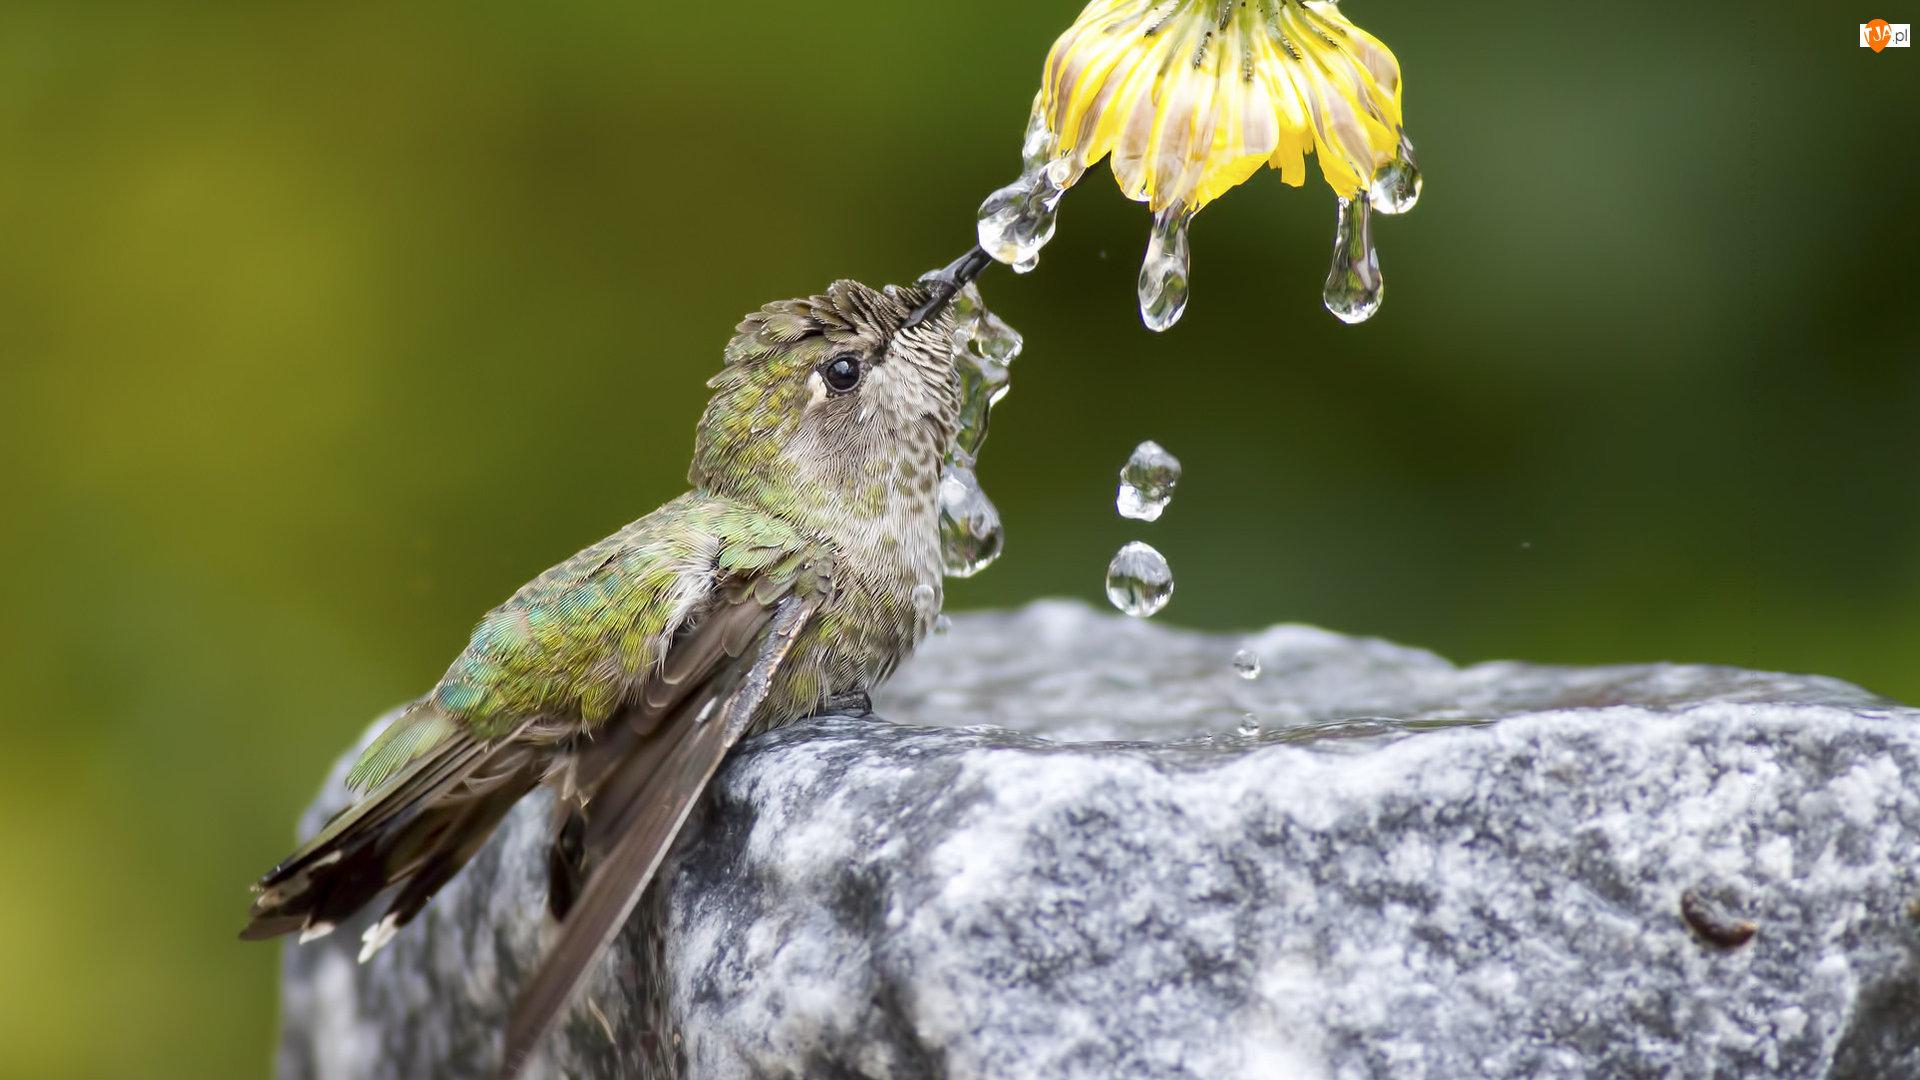 Koliber, Krople, Kwiat, Woda